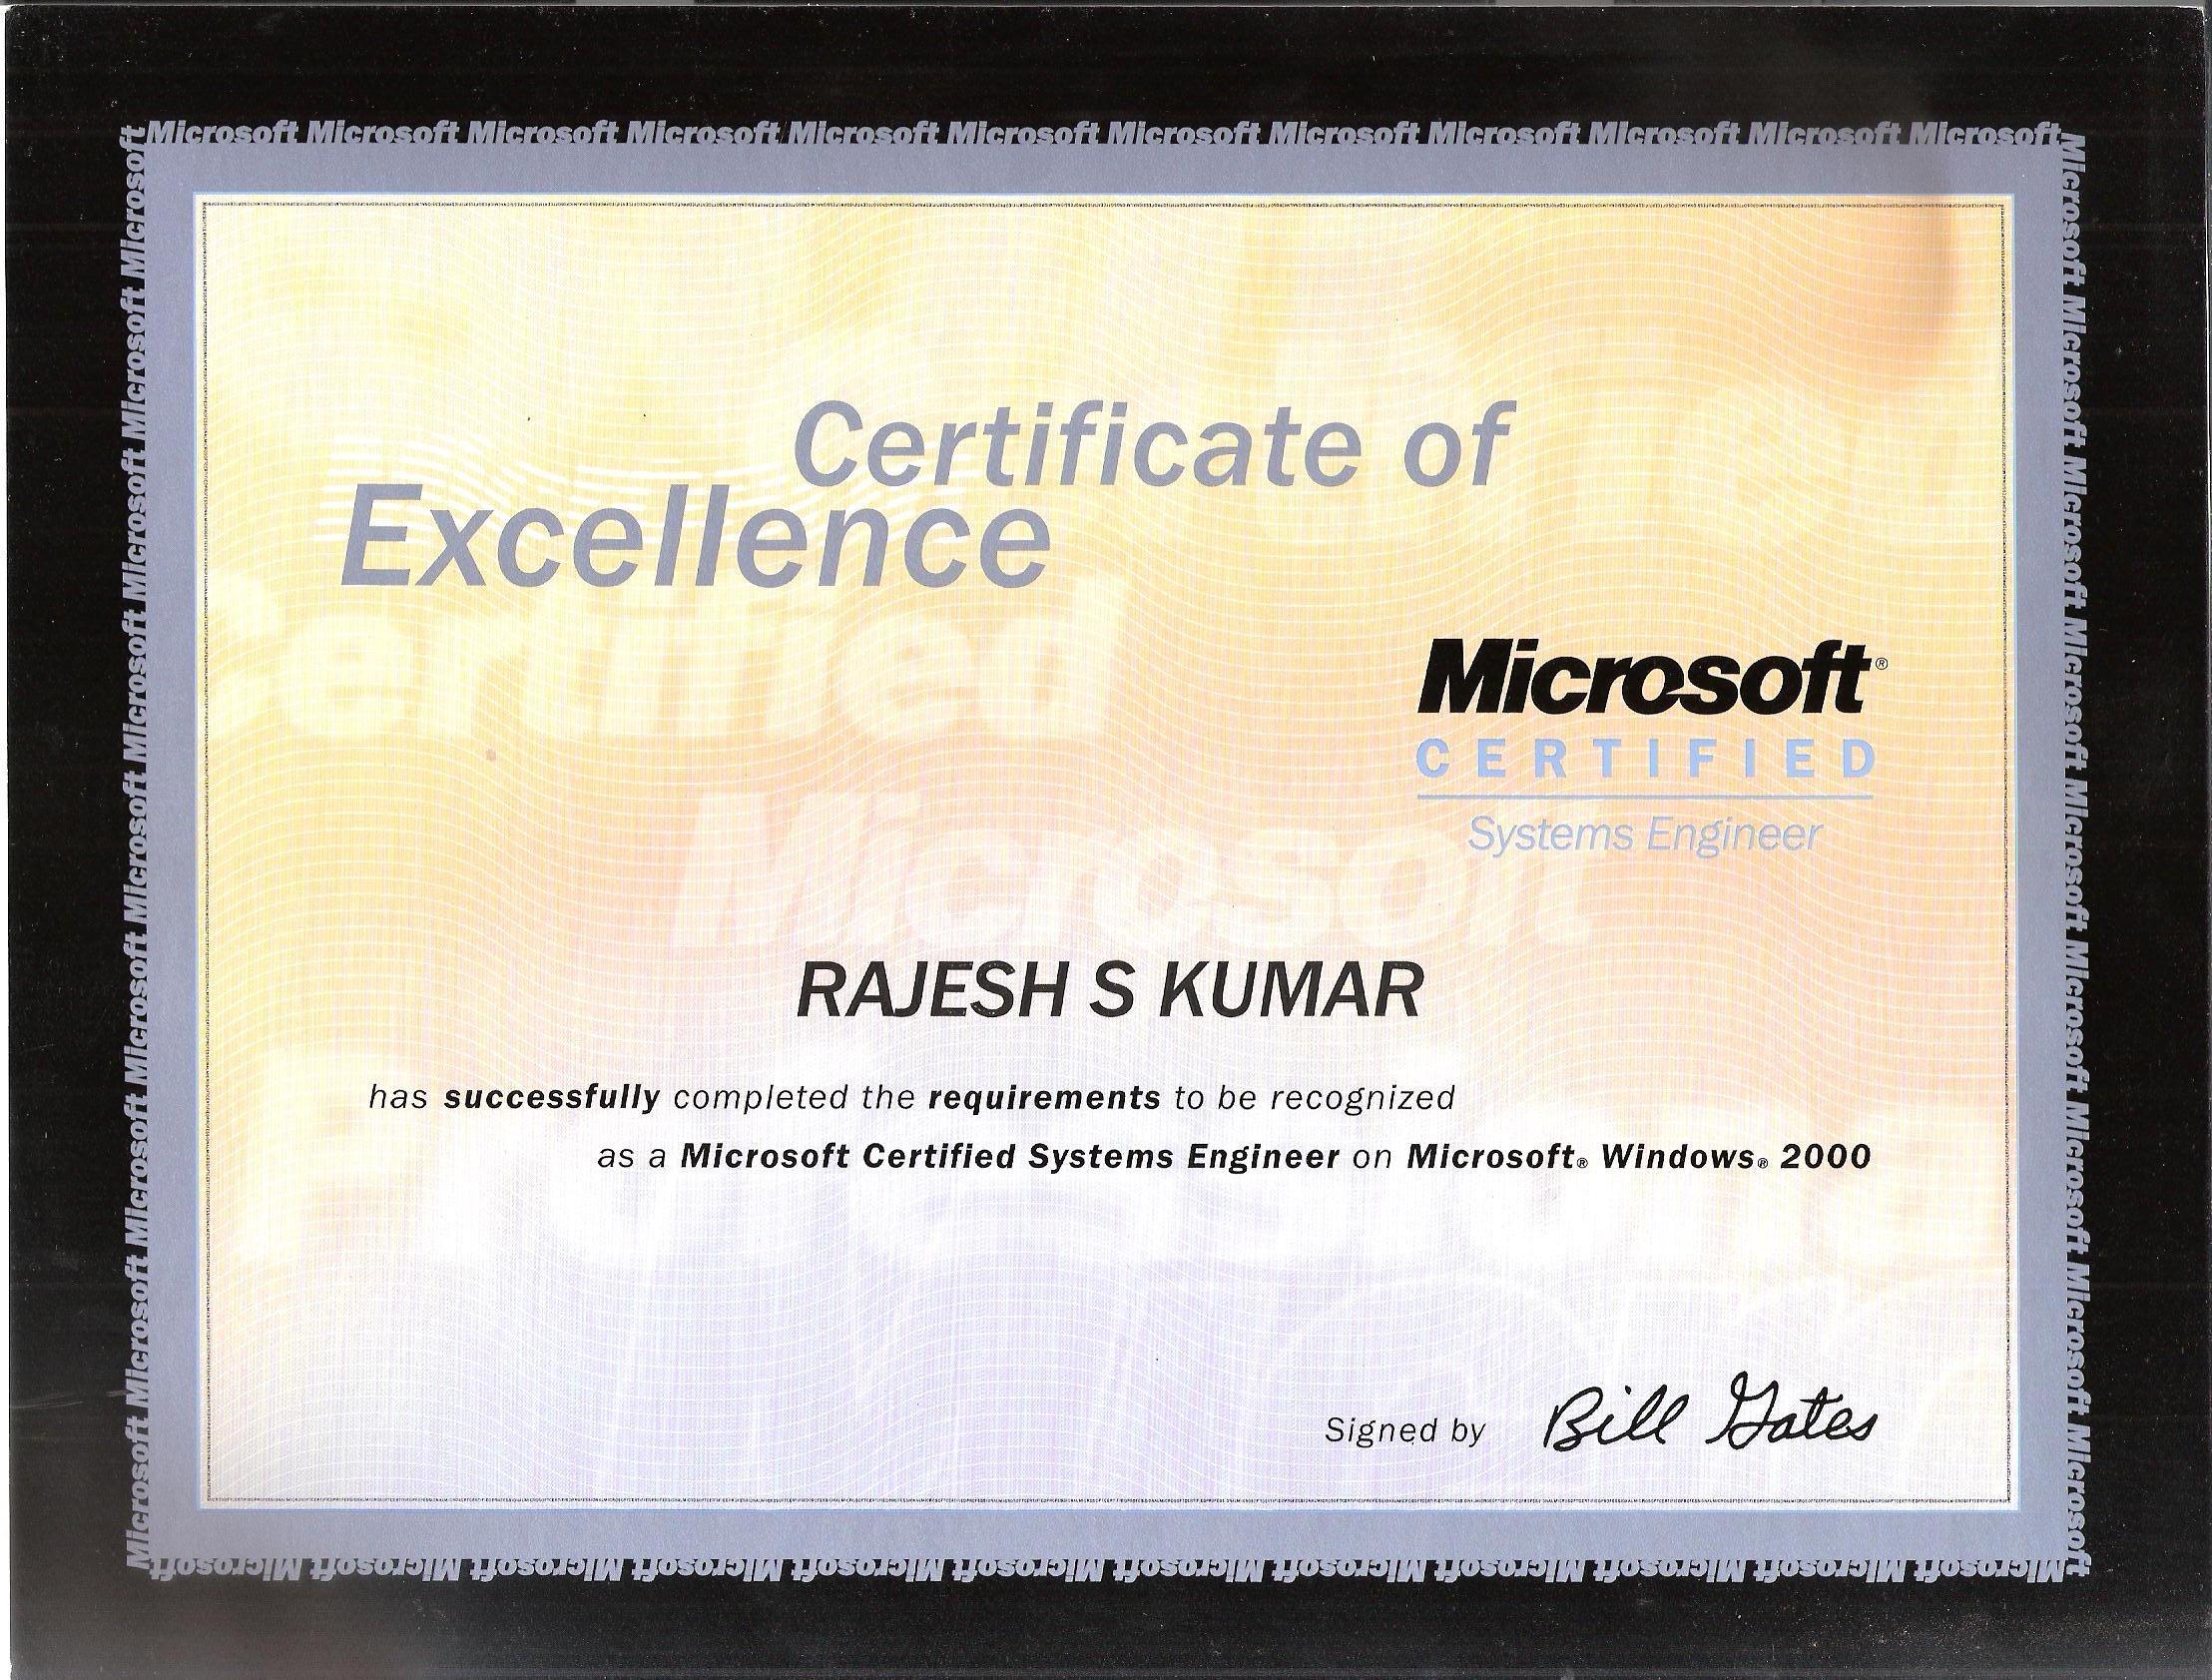 Rajesh Kumar S Bayt – Microsoft Certificate of Excellence